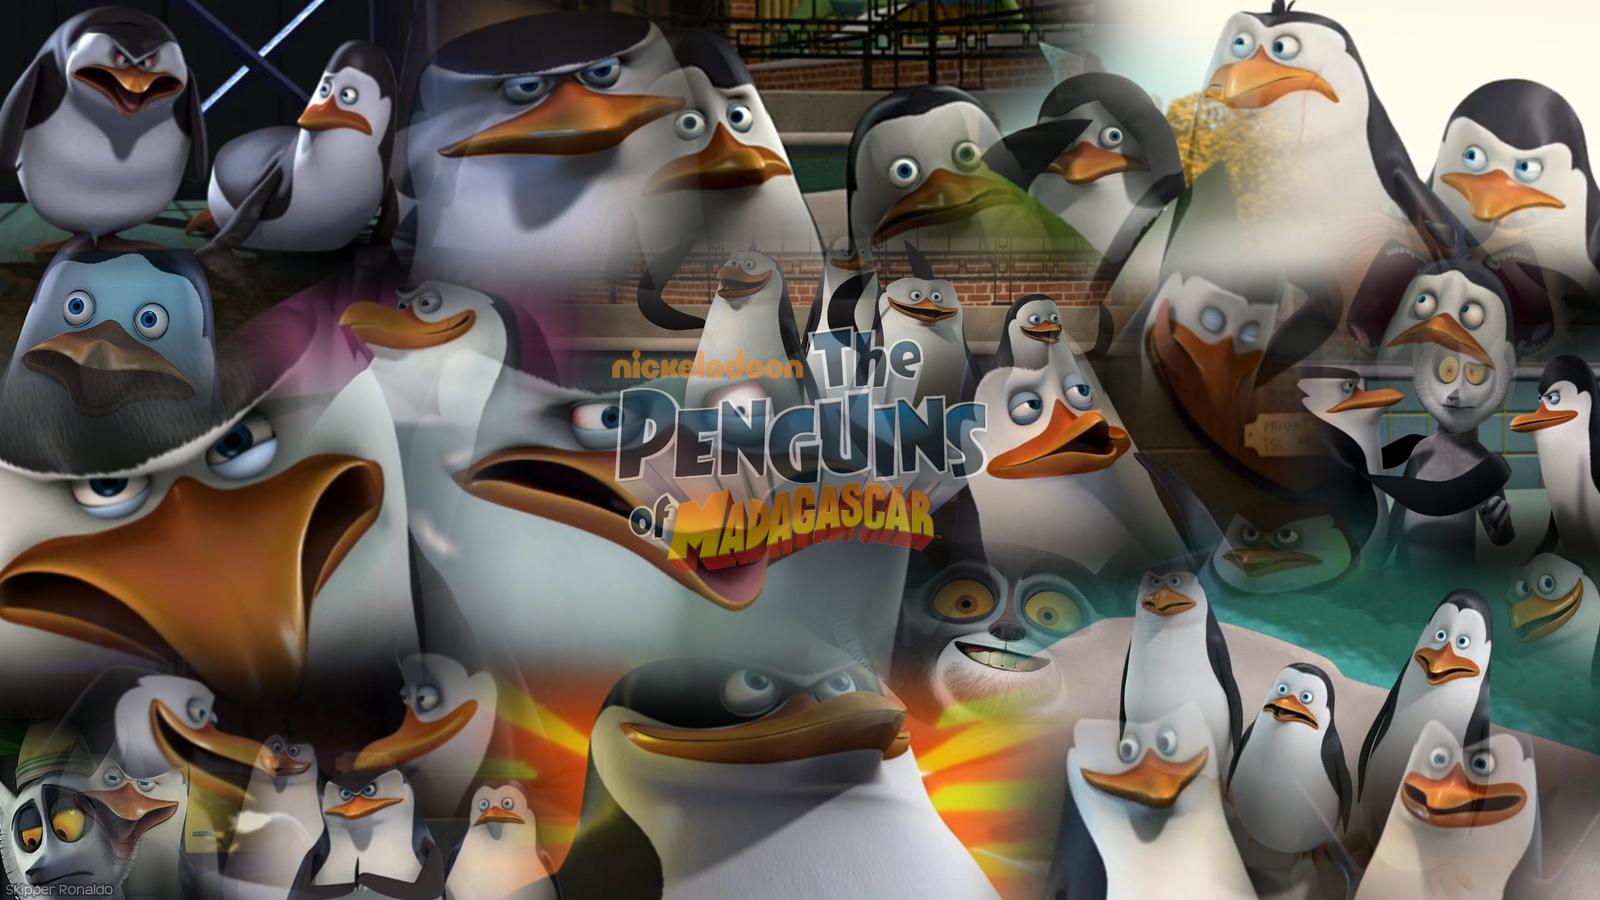 the penguins of madagascar los ping inos de taringa 867220 wallpaper